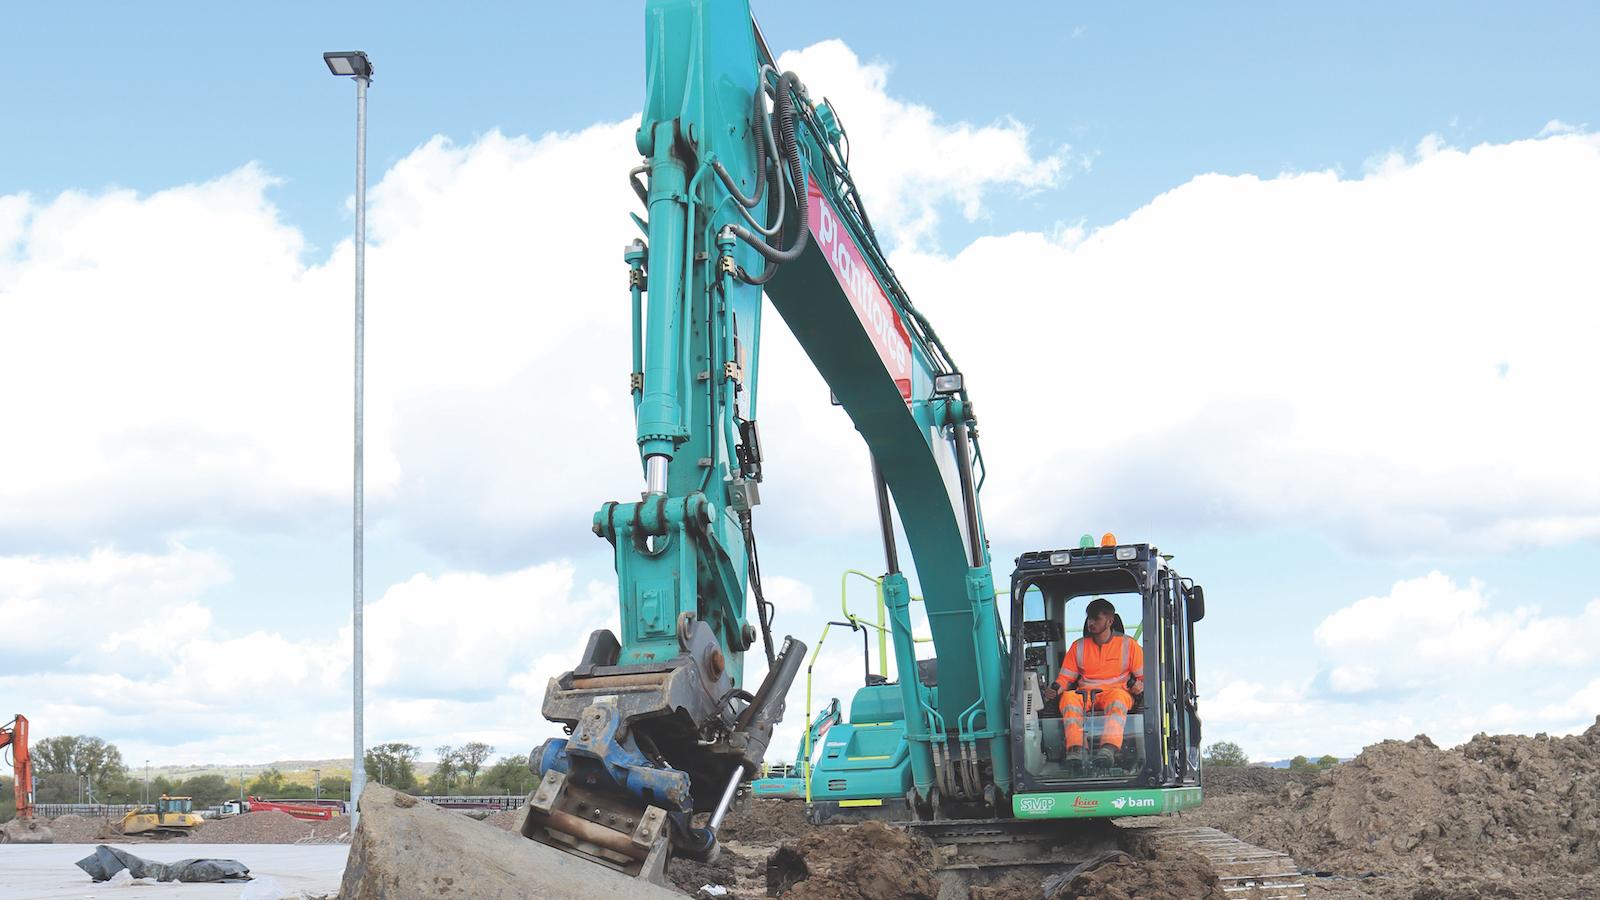 Leica machine control on a Kobelco excavator with SMP tiltrotator